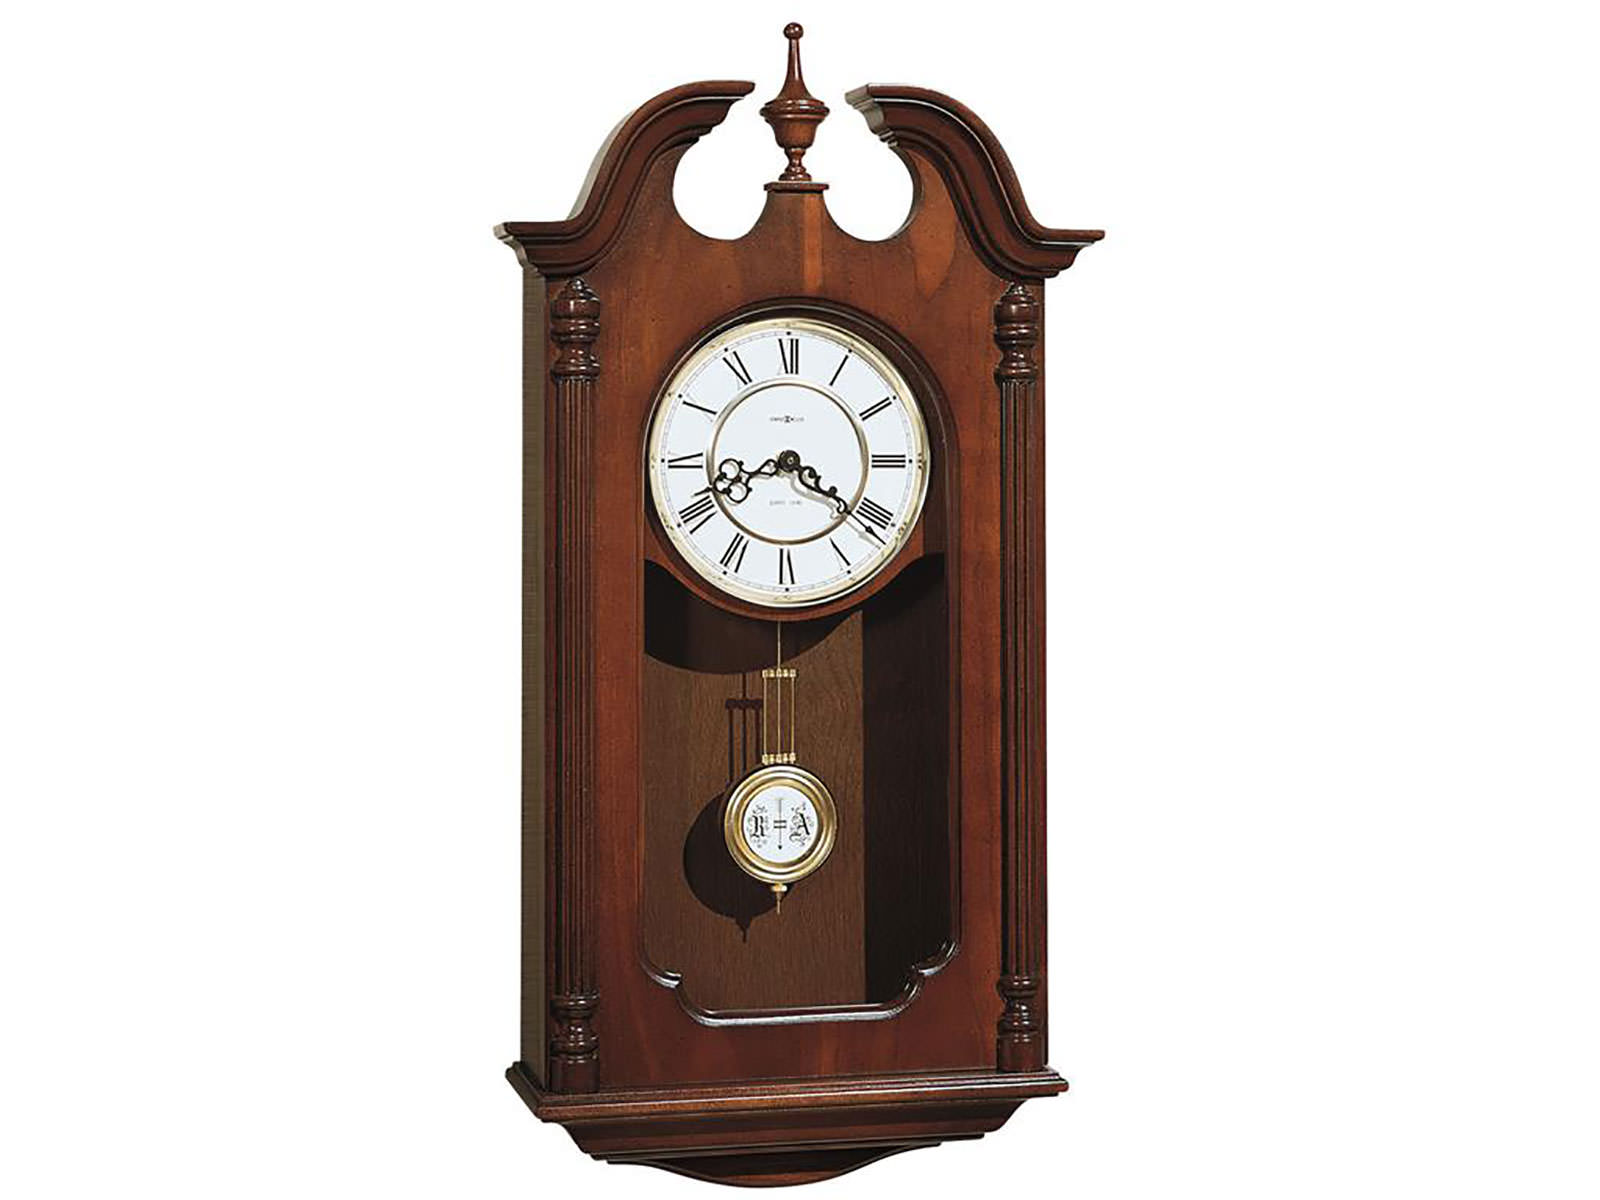 612 697 Danwood Wall Clock By Howard Miller